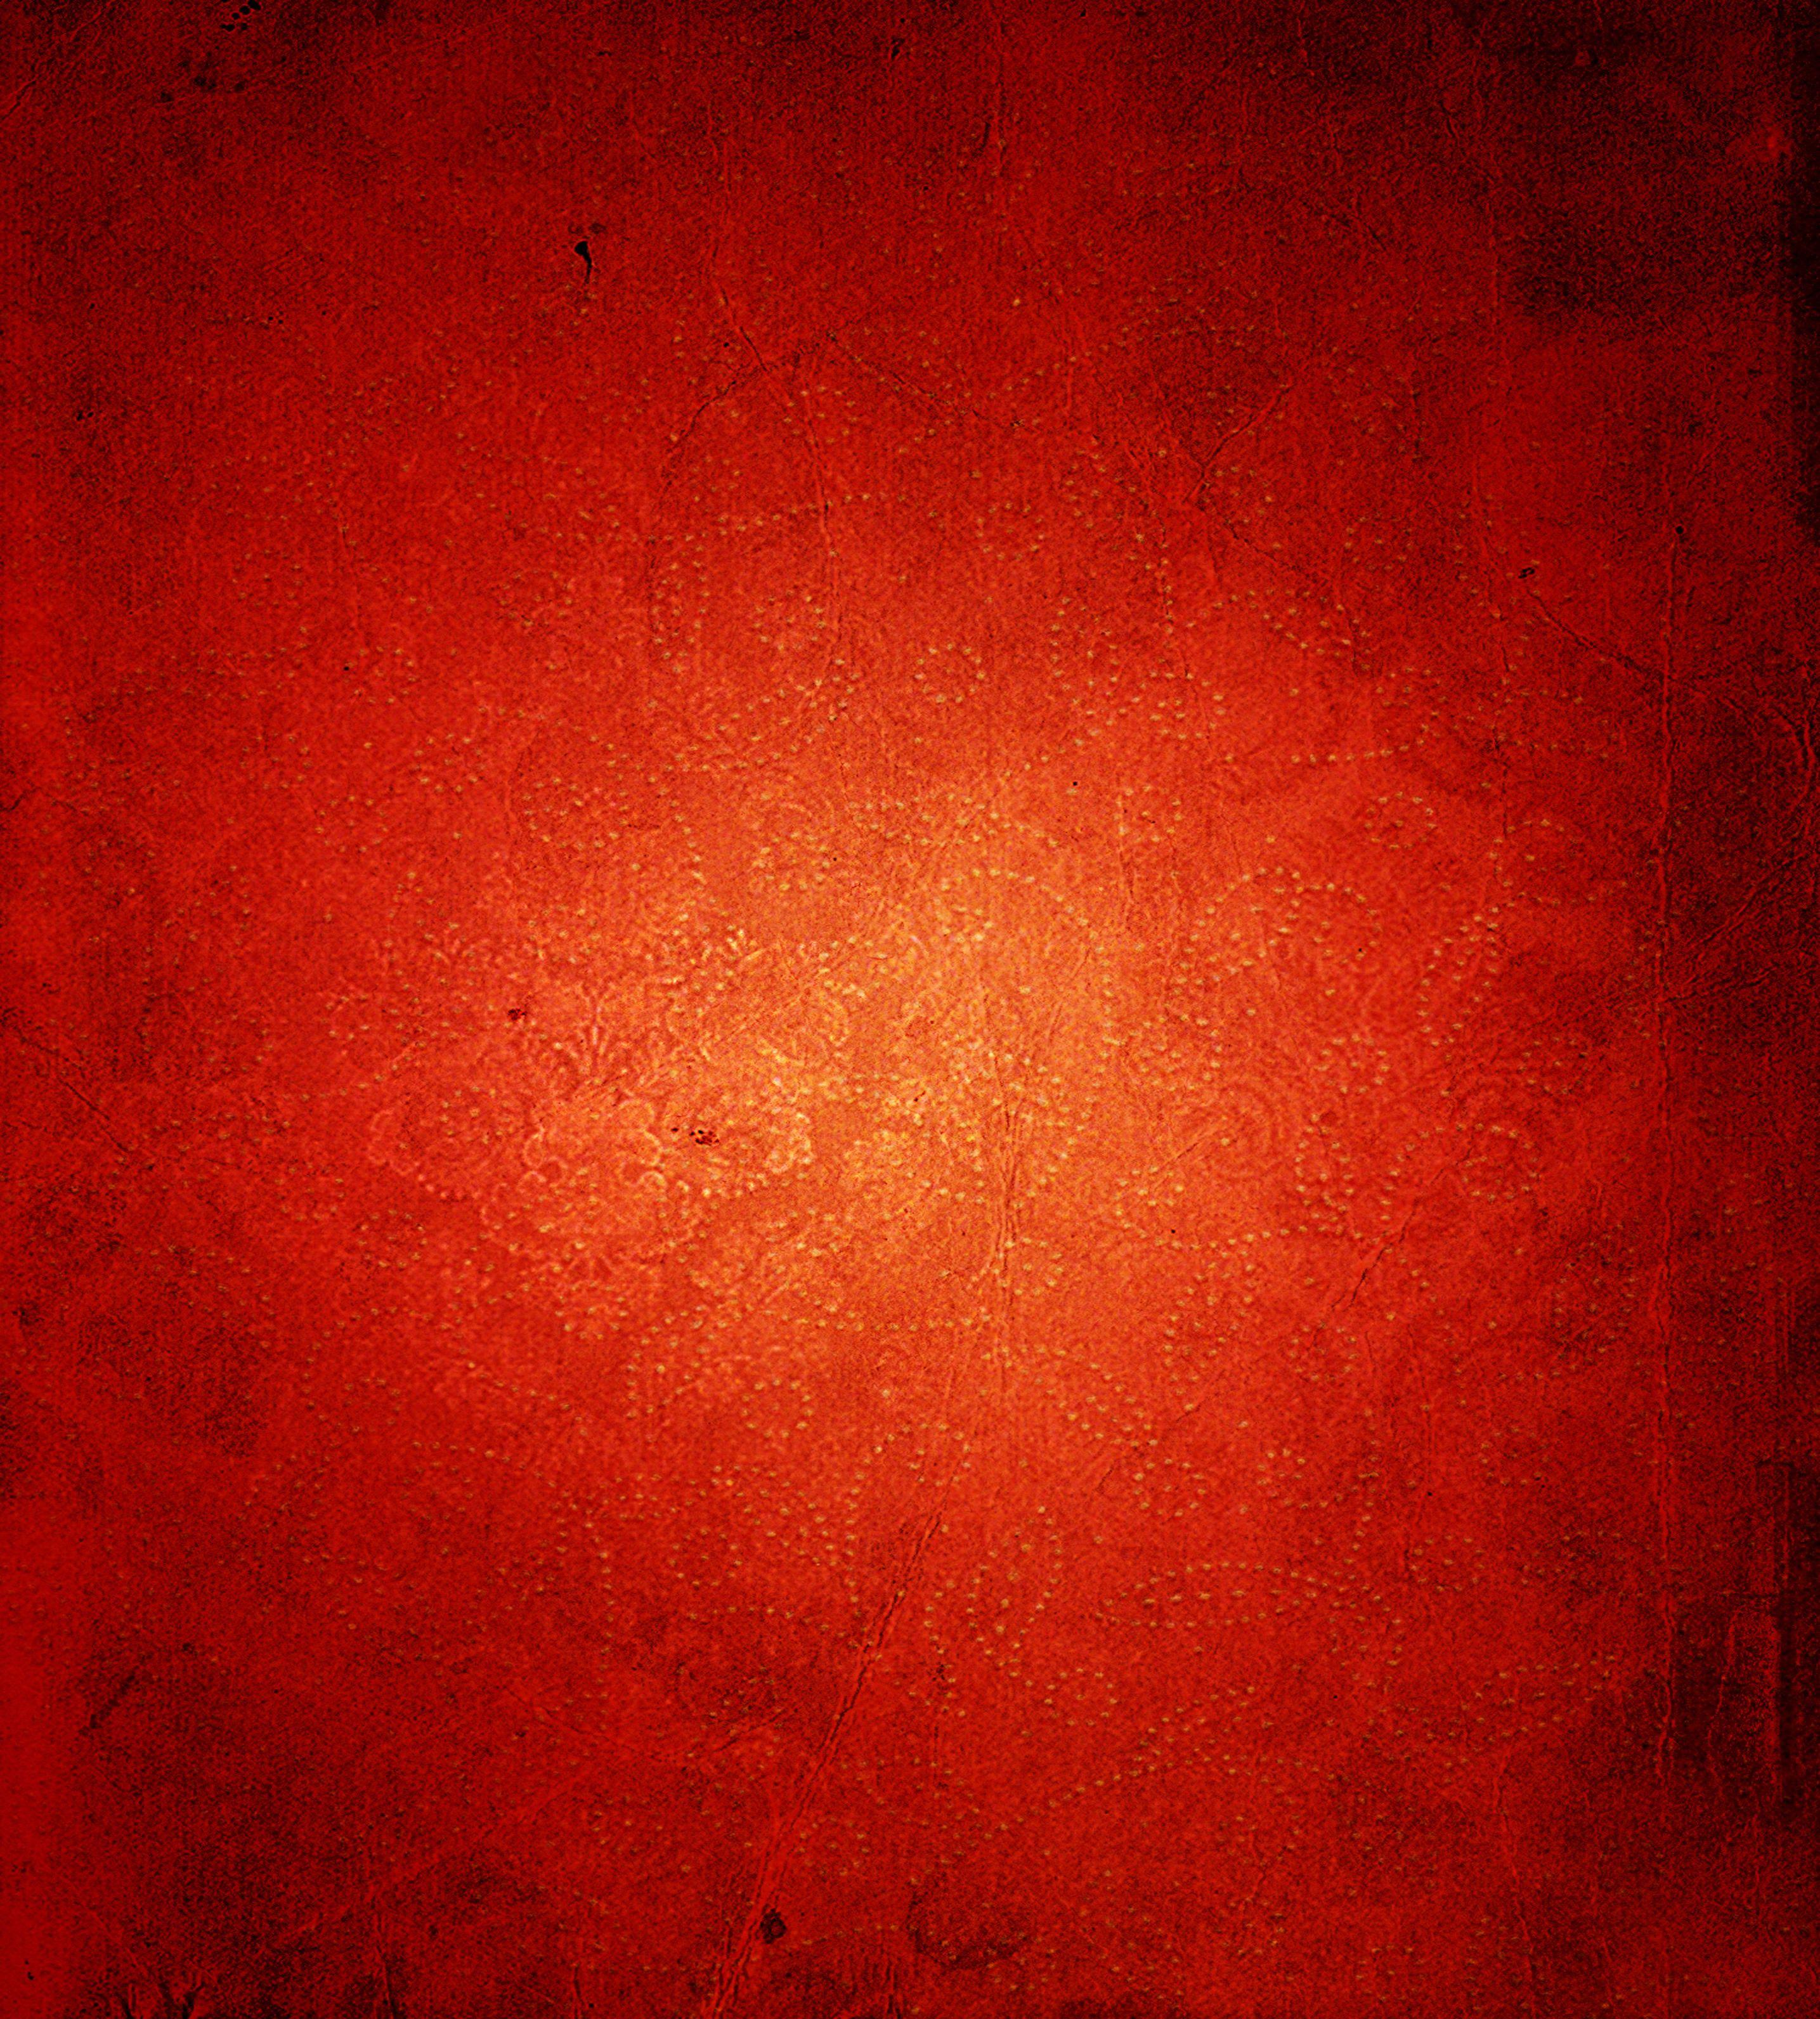 Red Background Images In 2019 Red Background Images Red